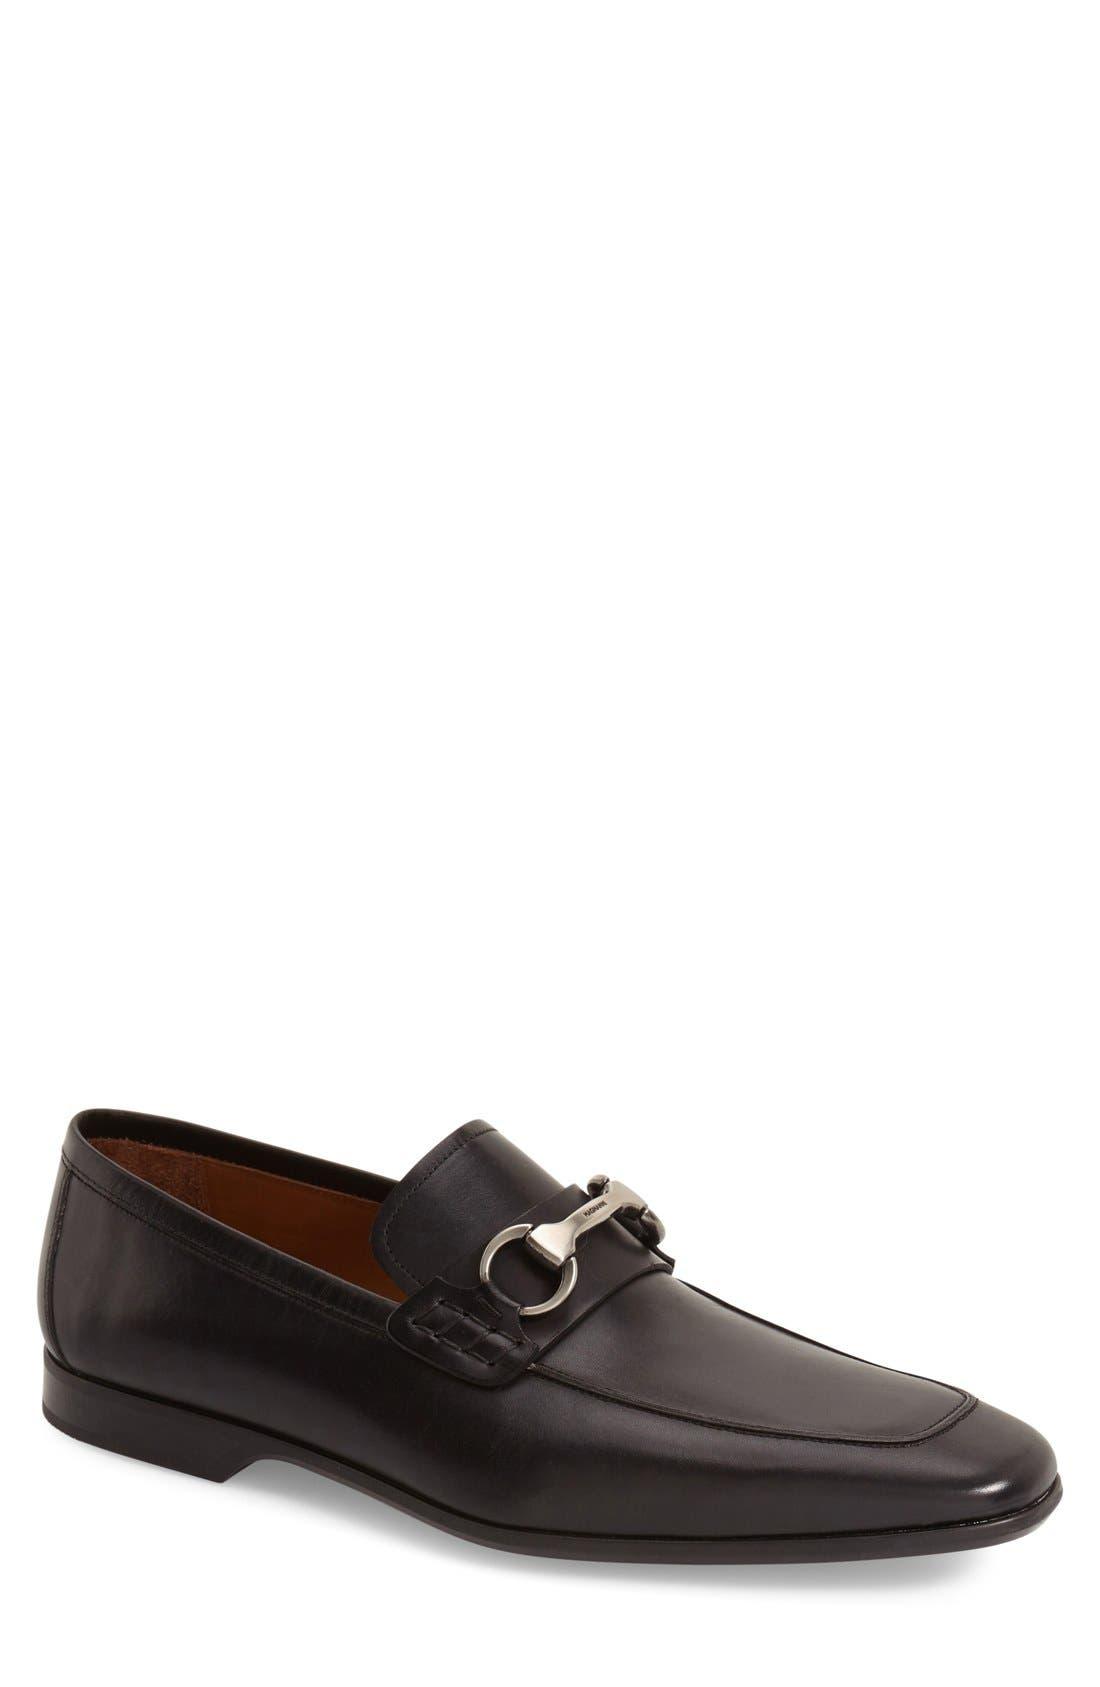 'Rafa II' Bit Loafer,                         Main,                         color, BLACK LEATHER